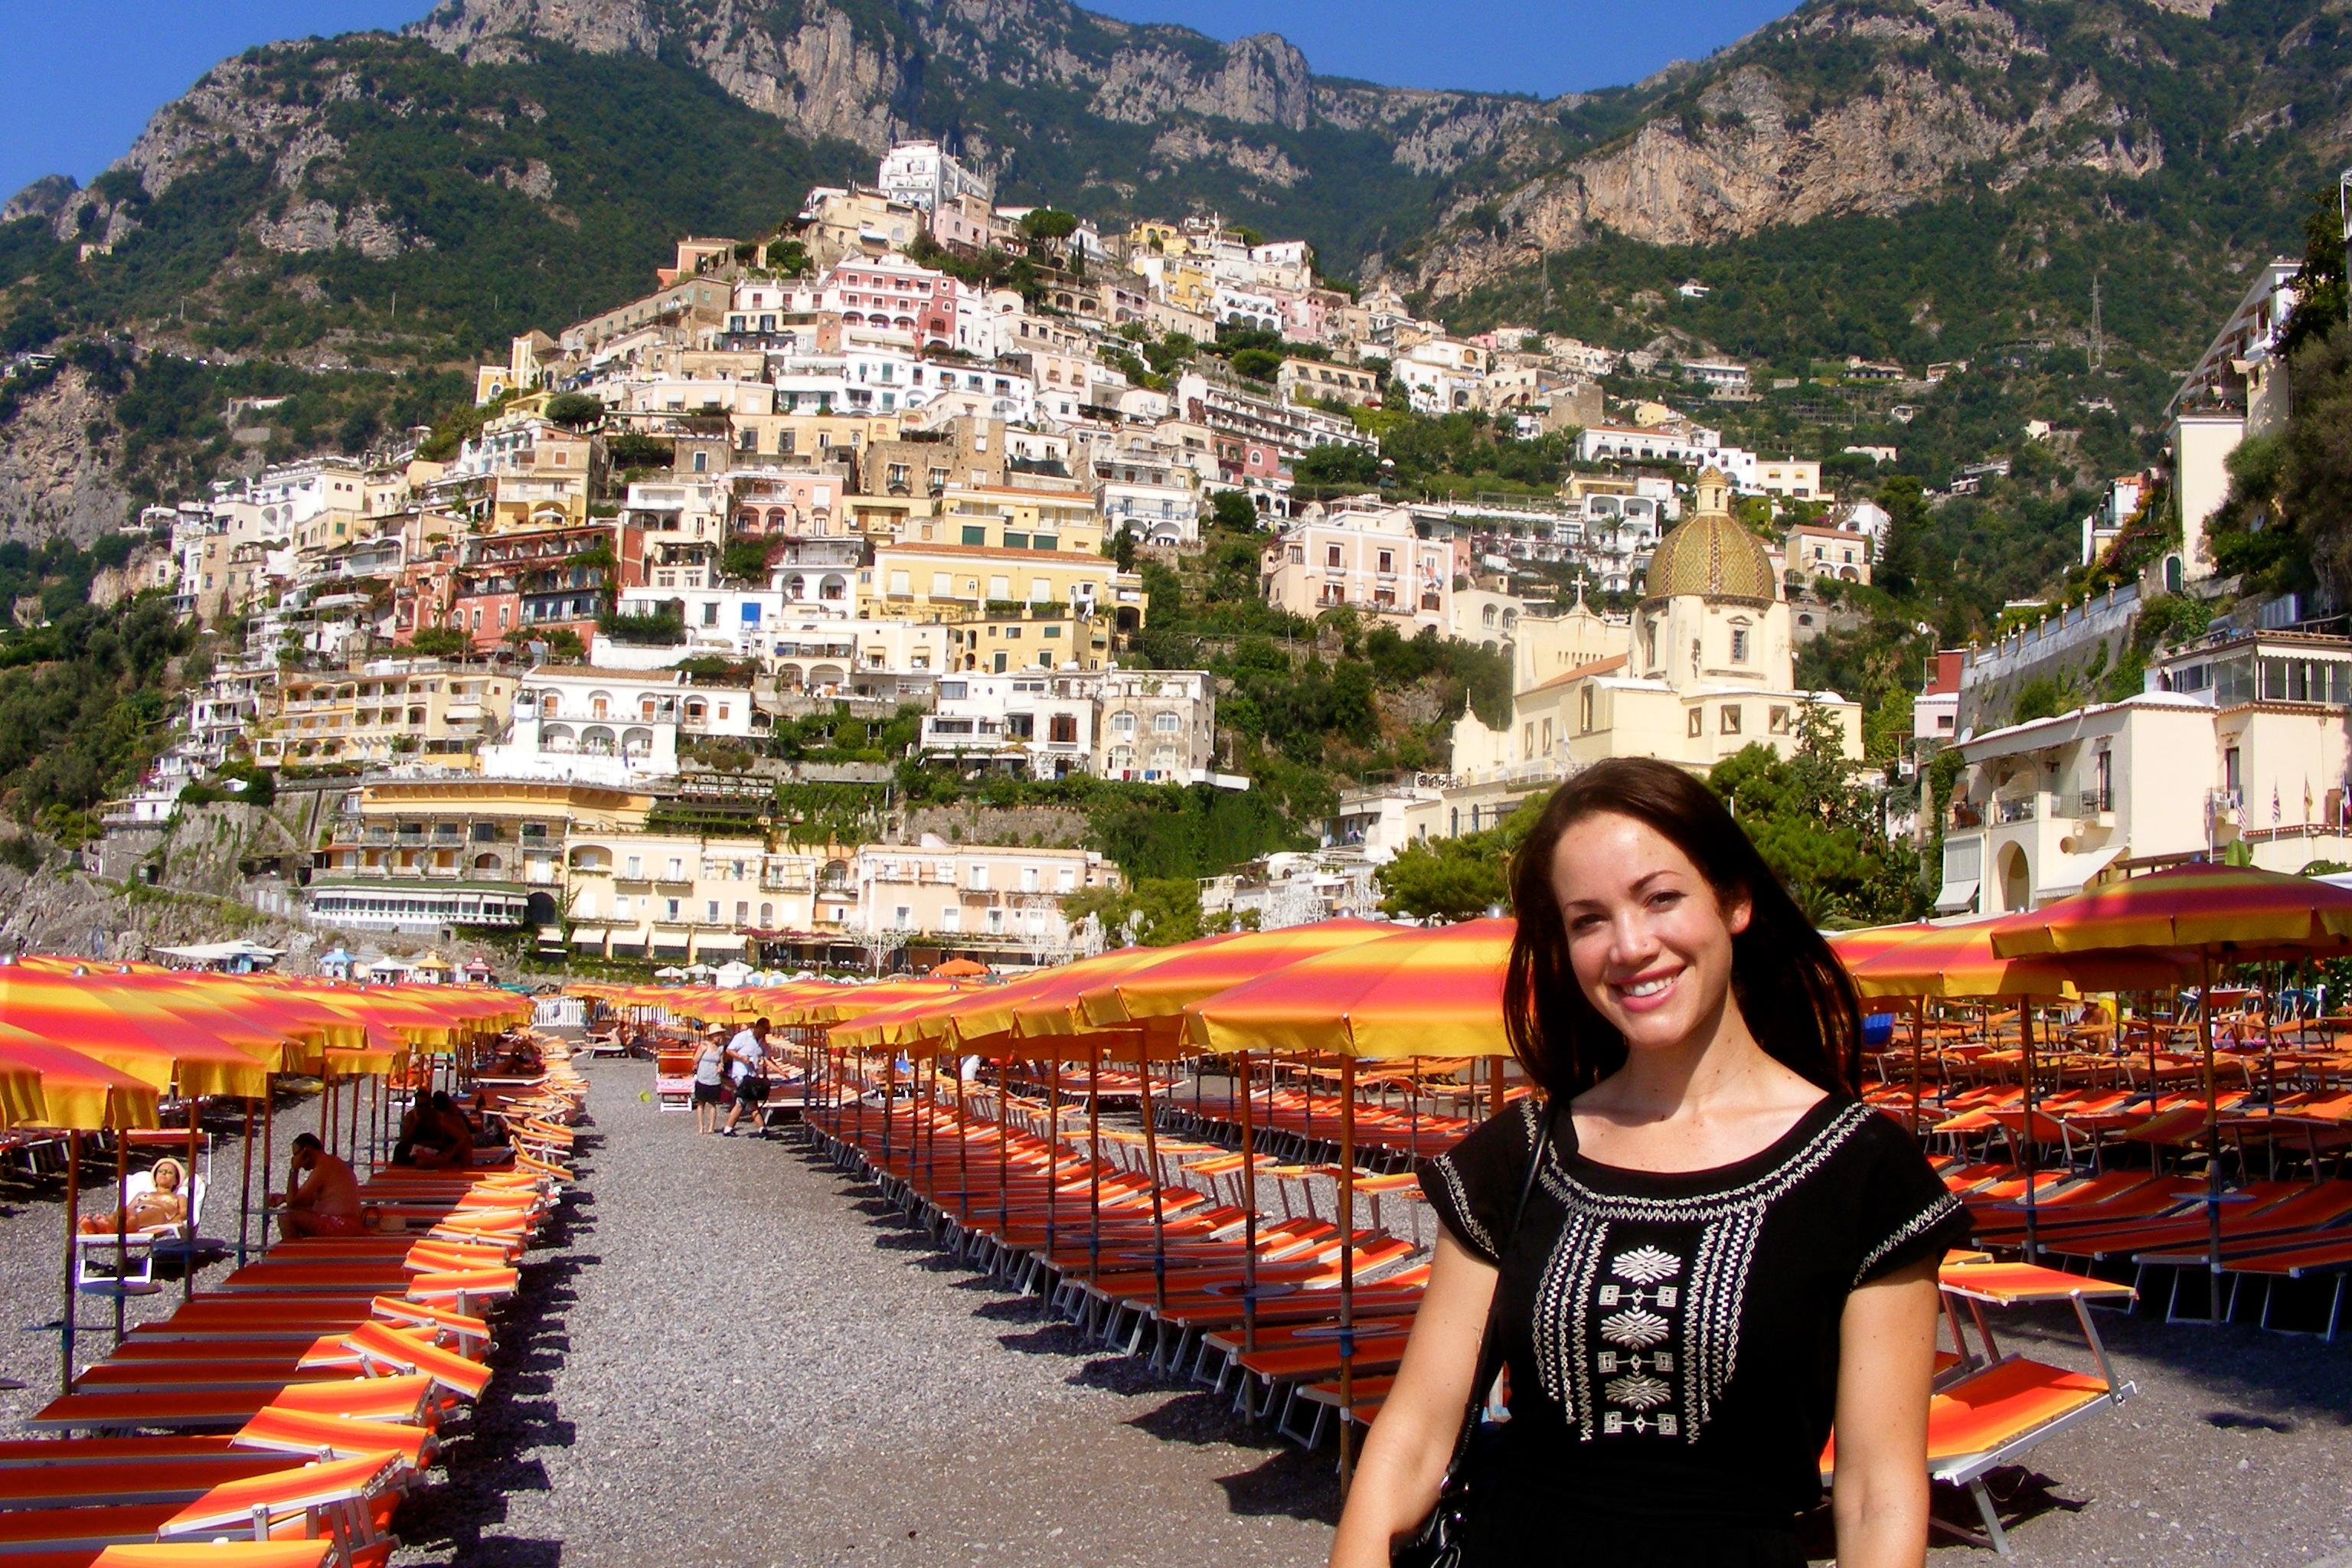 positano amalfi coast italy beach umbrellas